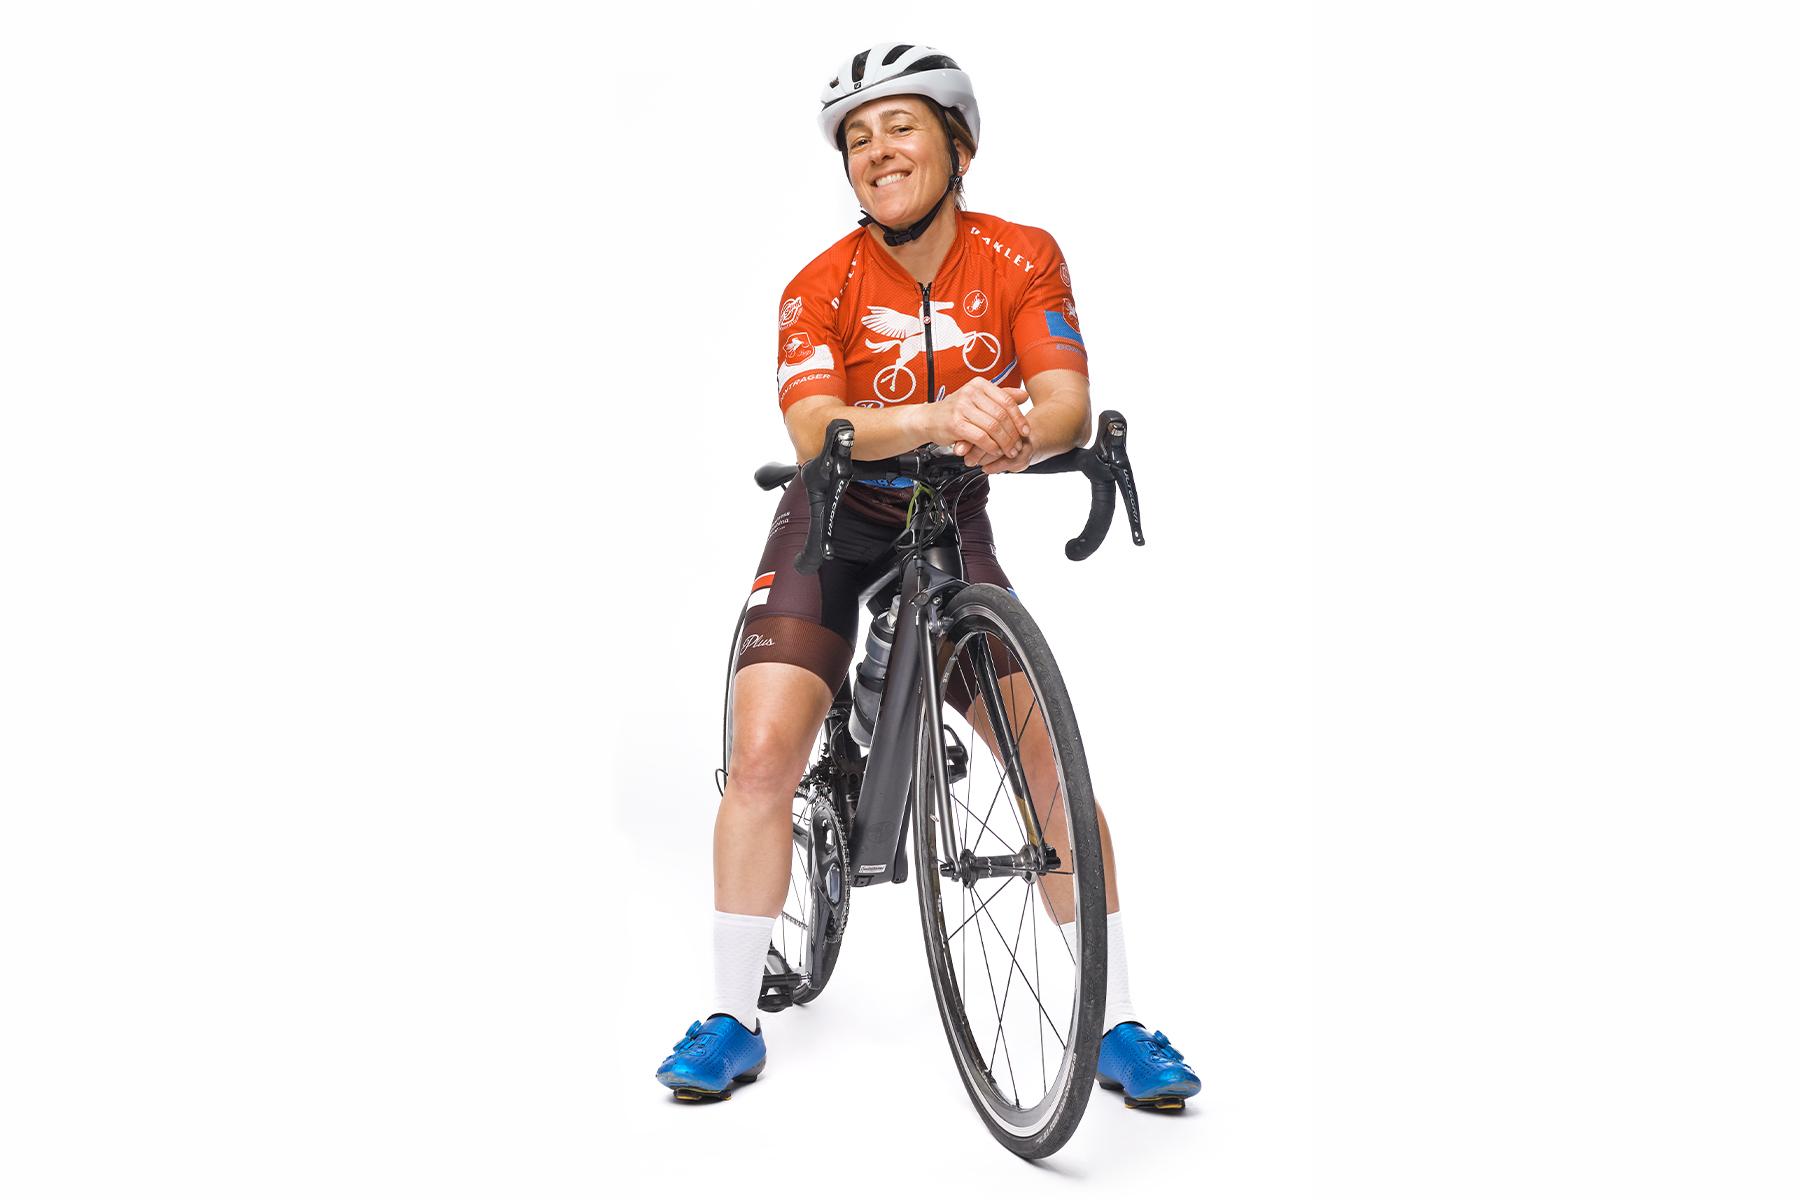 melissa monosoff dallas cyclist